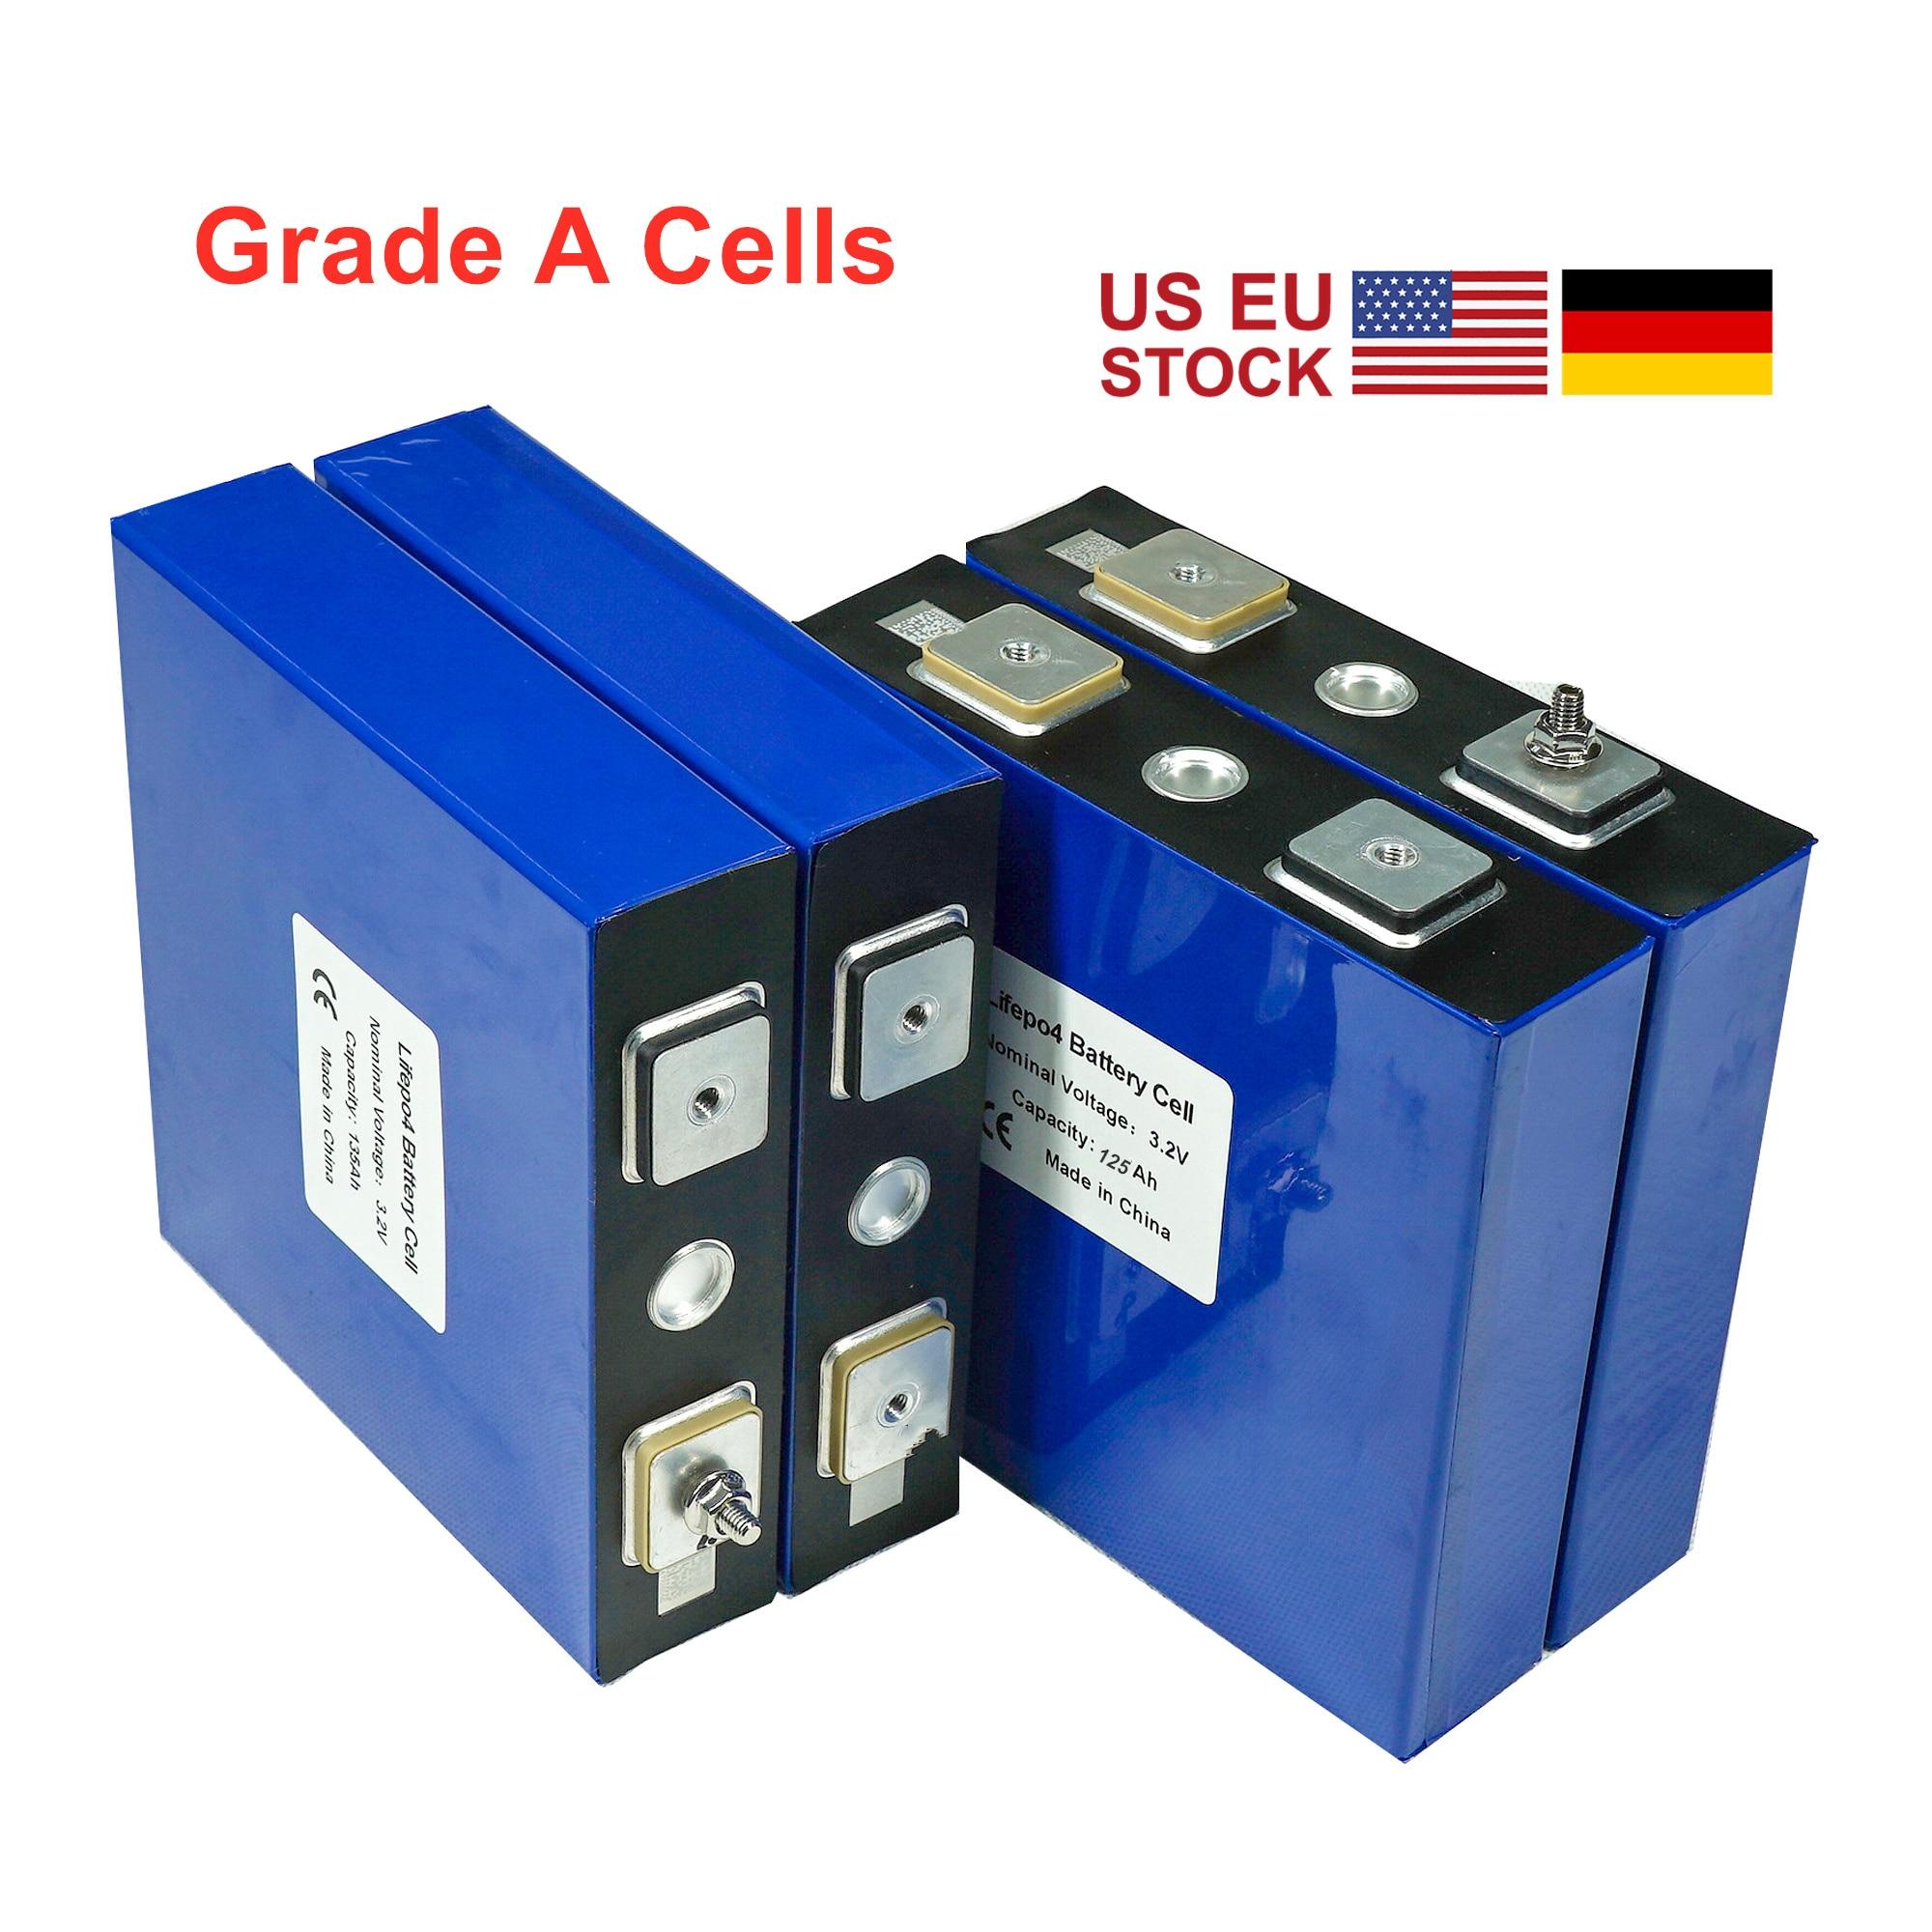 4PCS 3,2 V 120Ah 125Ah Lifepo4 Batterie 2021 Neue GRADE A LFP Lithium-Solar 12V 24V 48V Zellen Nicht 150ah 200AH UPS Schnelle Lieferung